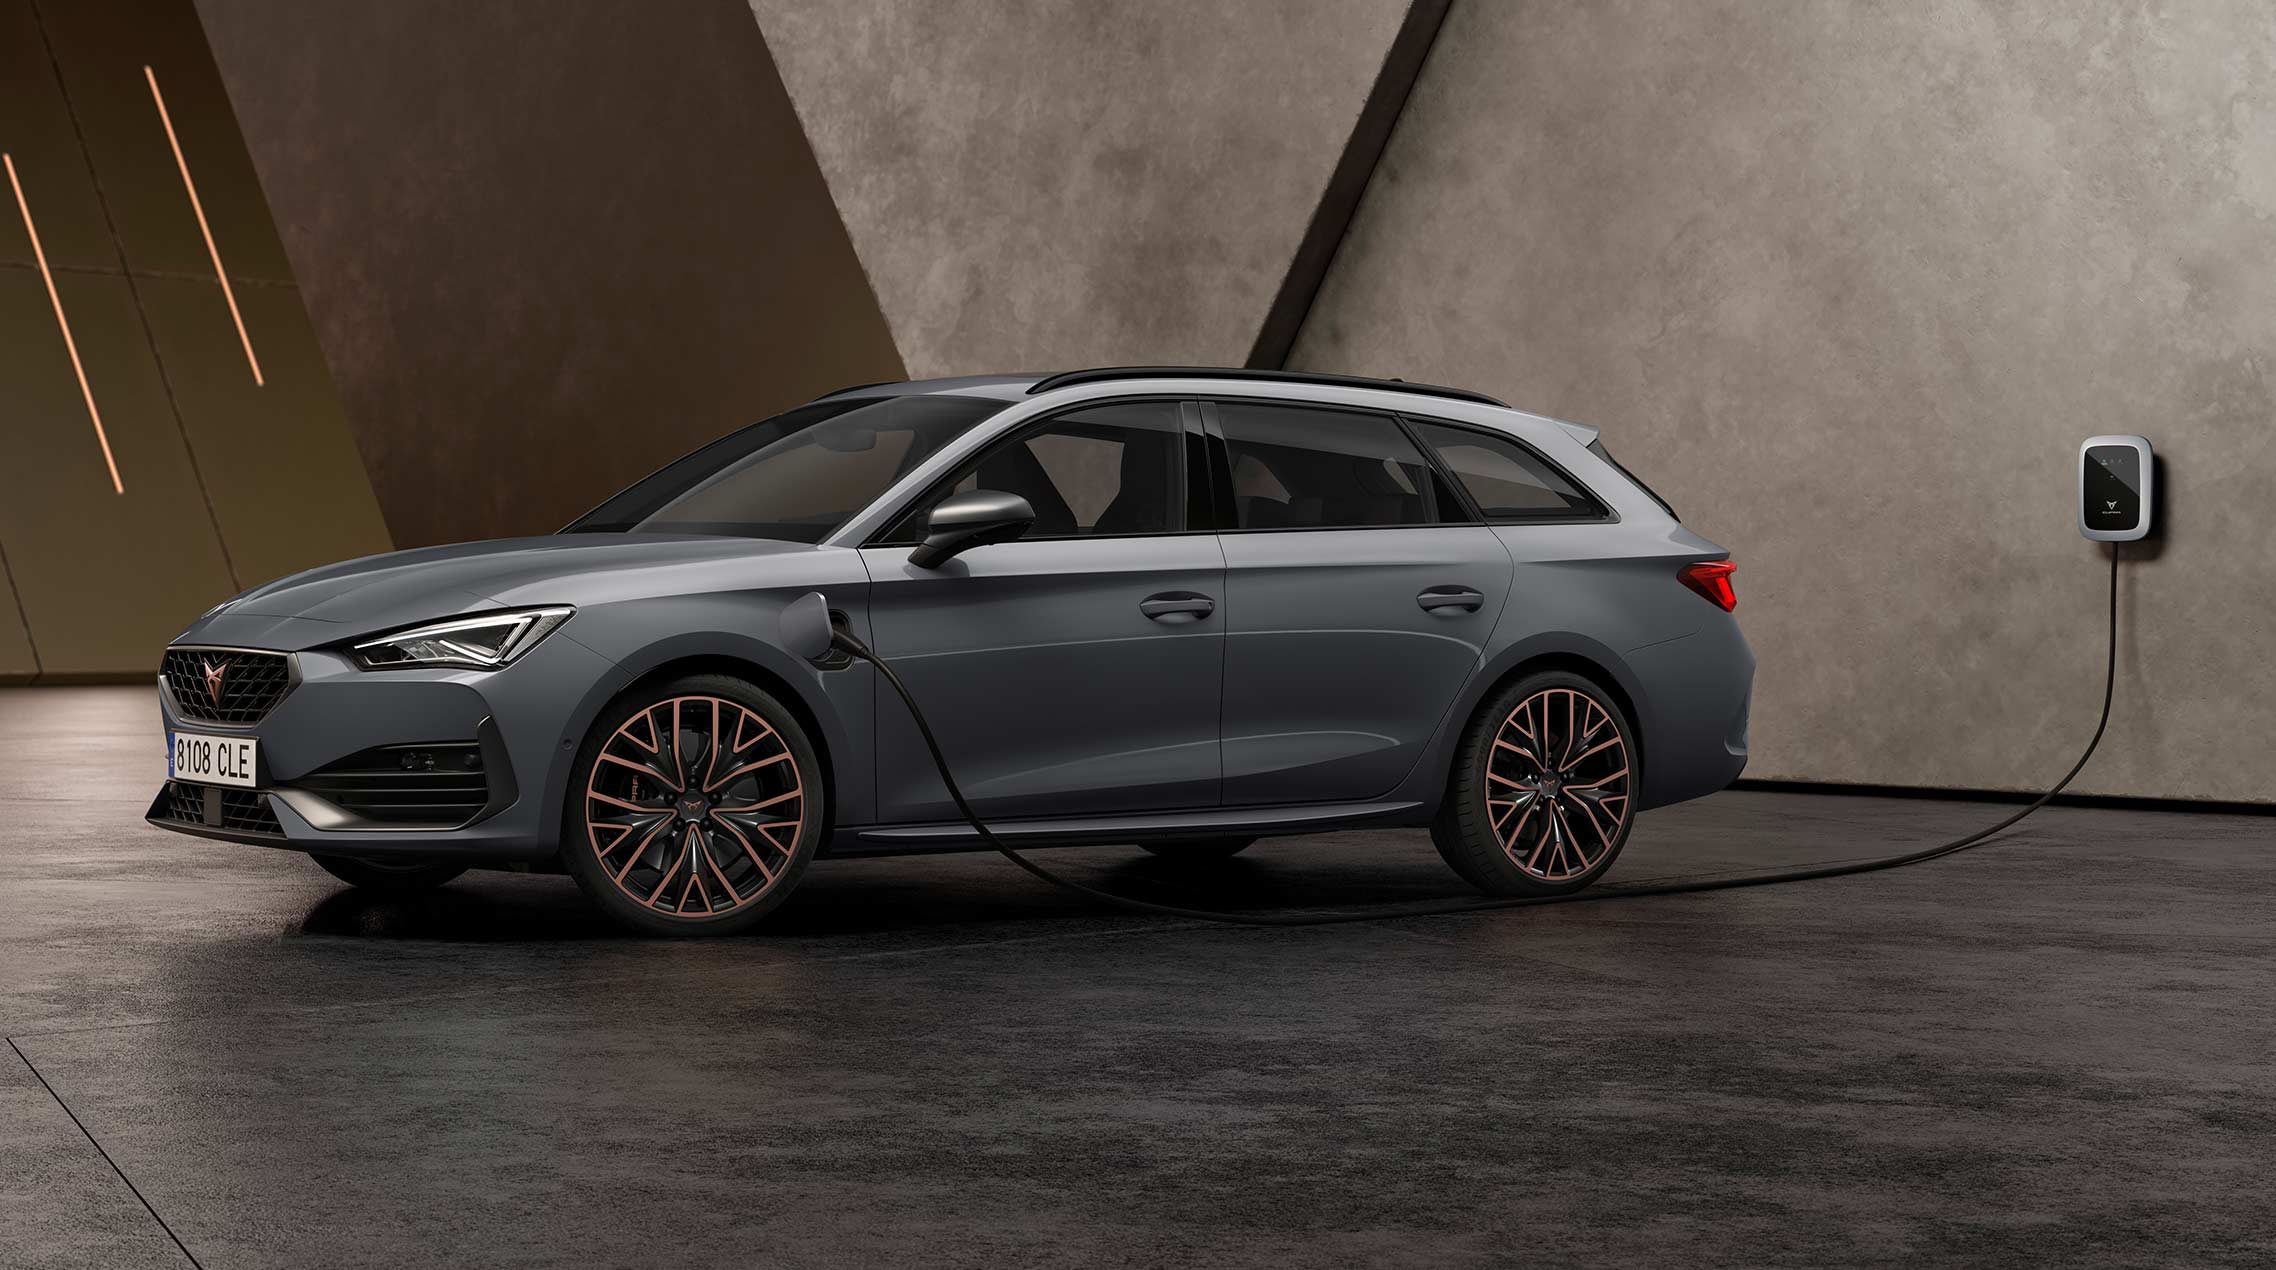 new CUPRA Leon Sportstourer ehybrid family sports car in graphene grey colour specifications